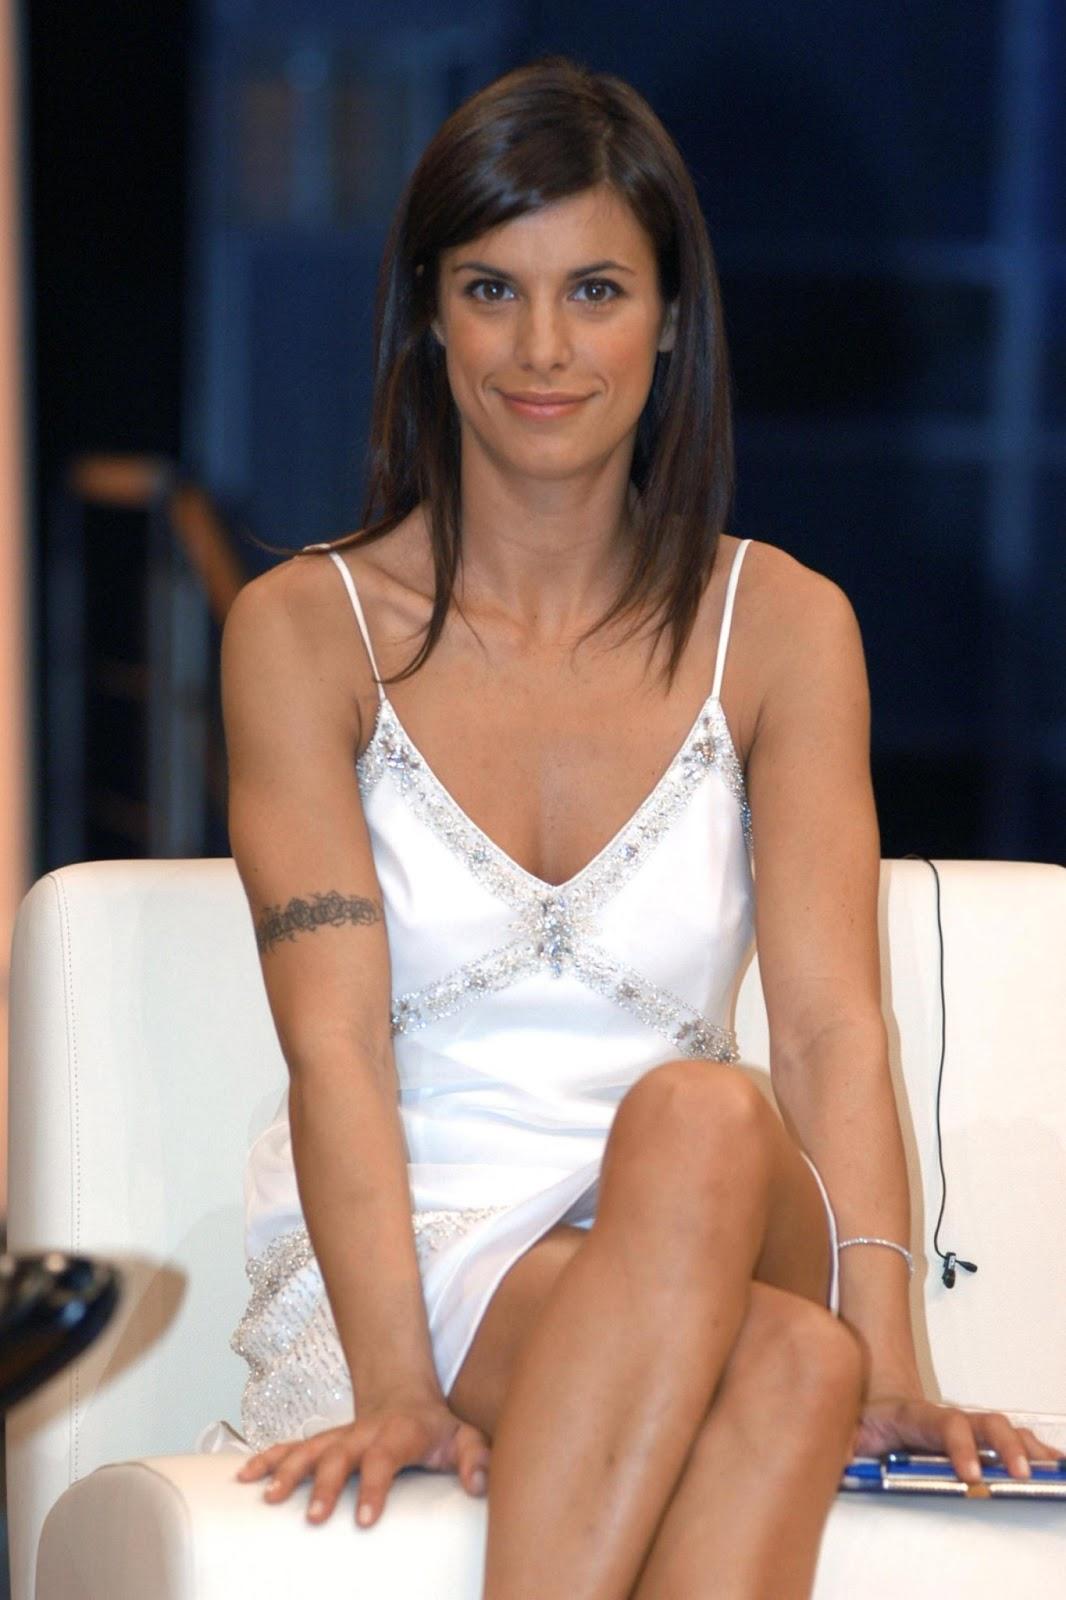 Elisabetta canalis nude photos 49